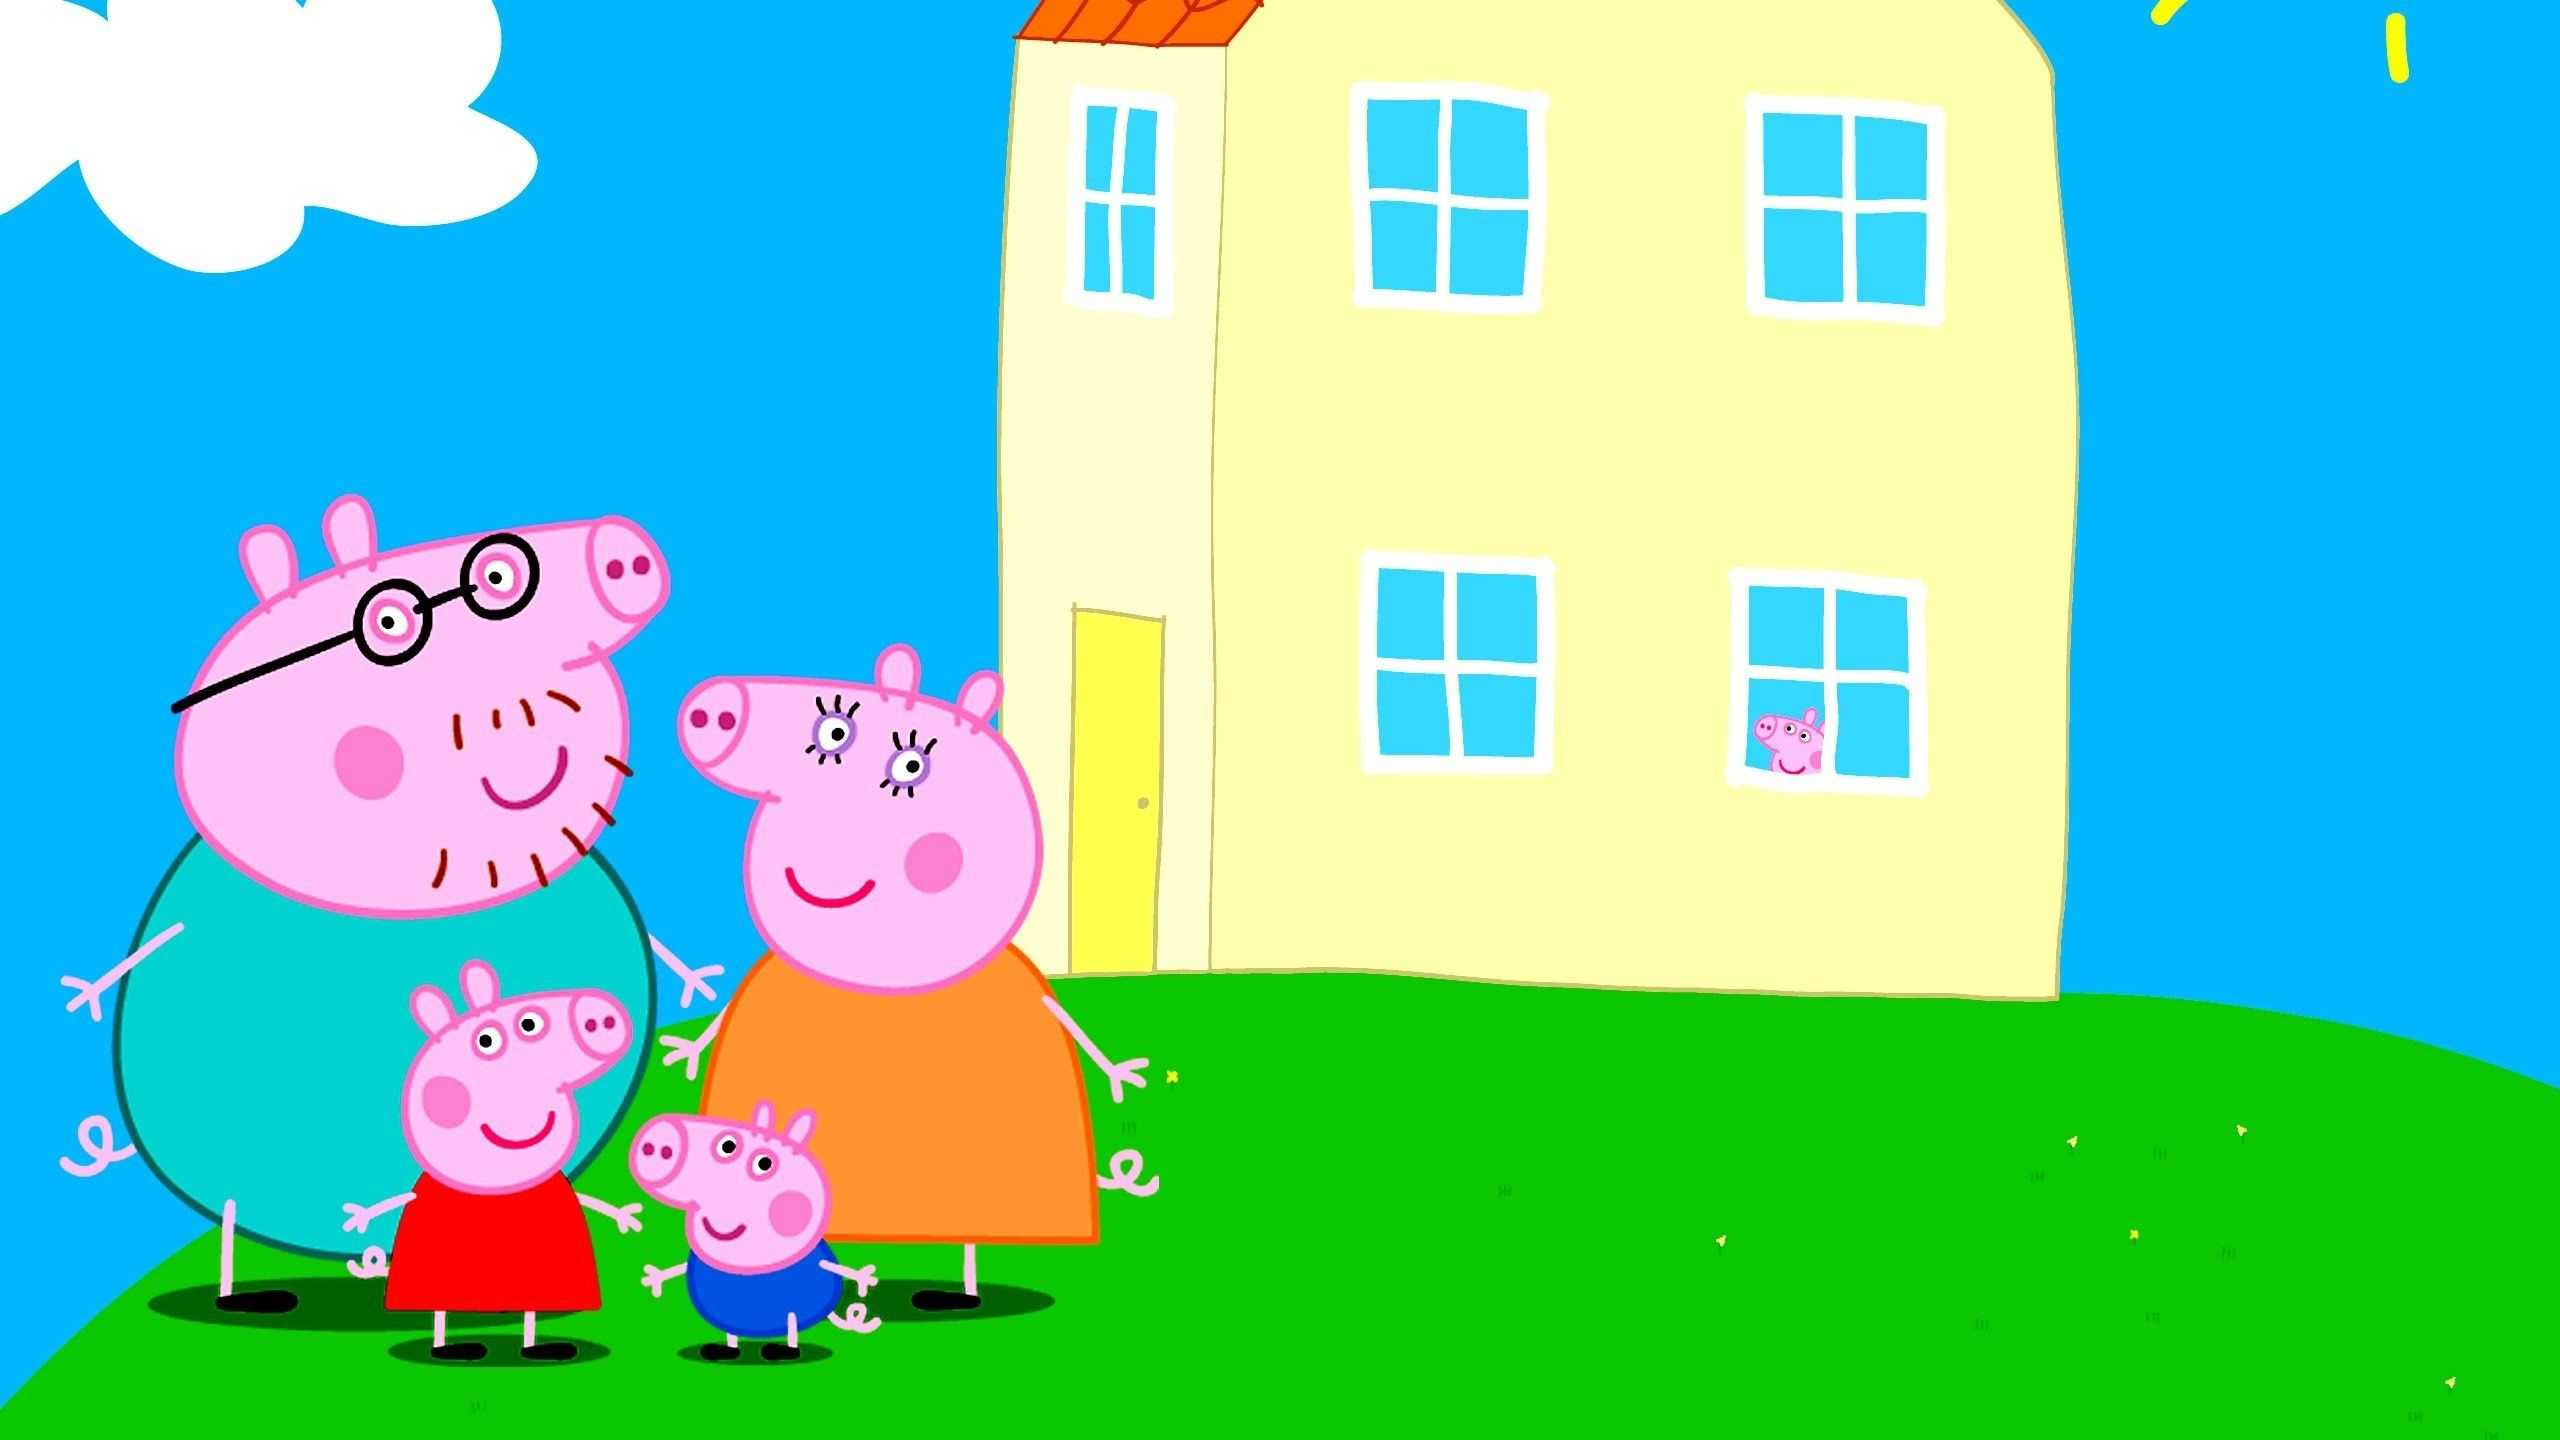 Peppa Pig House Wallpaper   NawPic 2560x1440